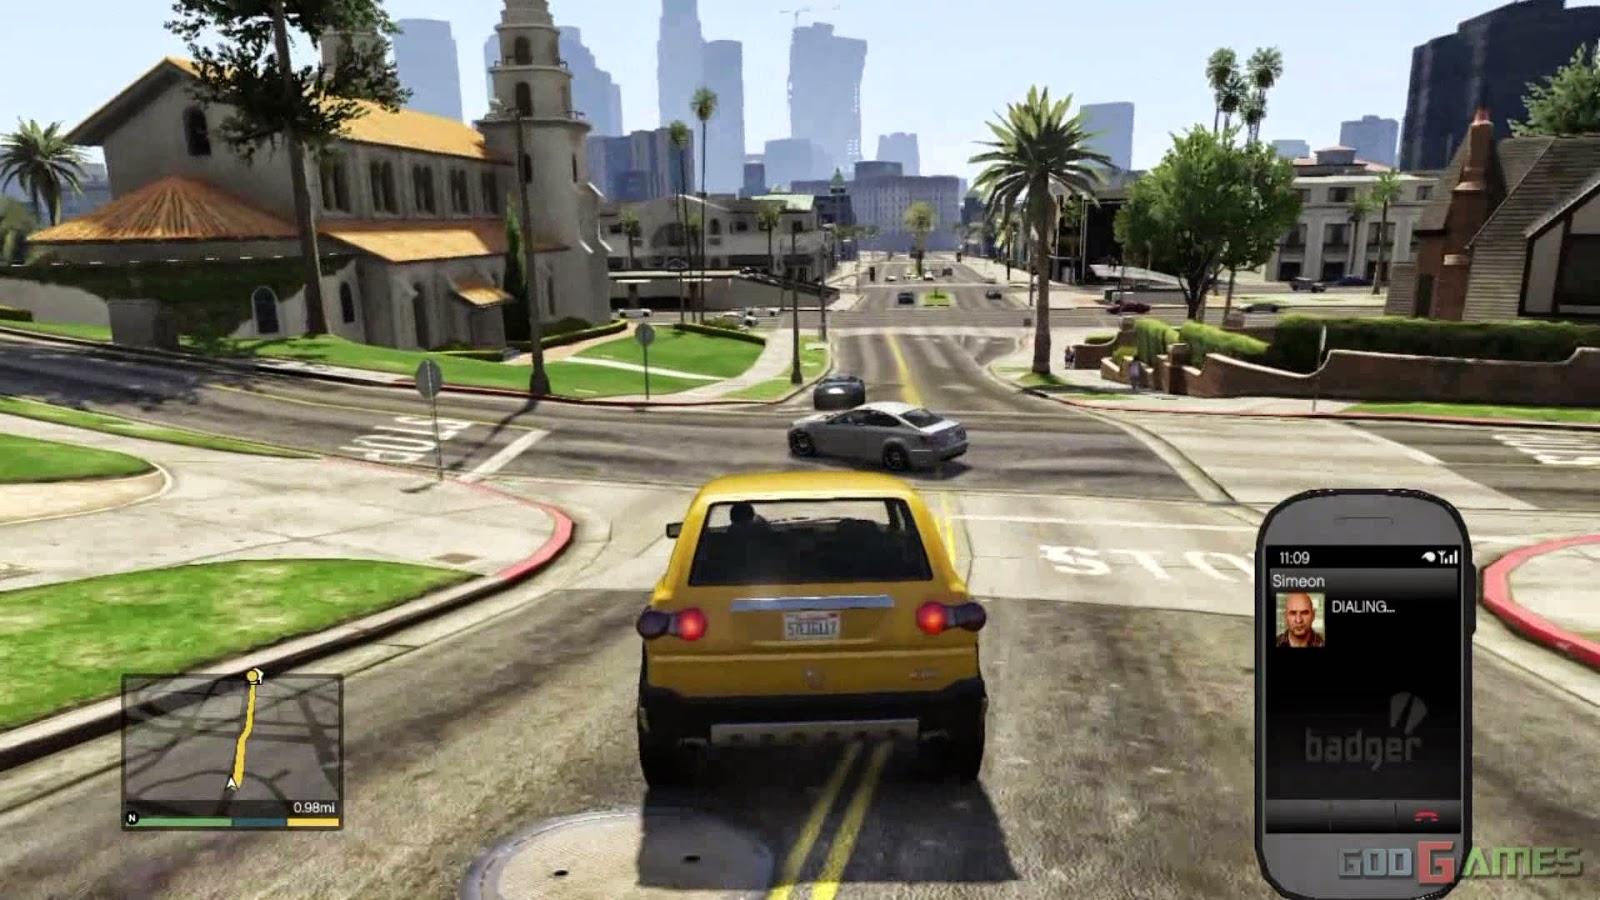 gta v city free download games